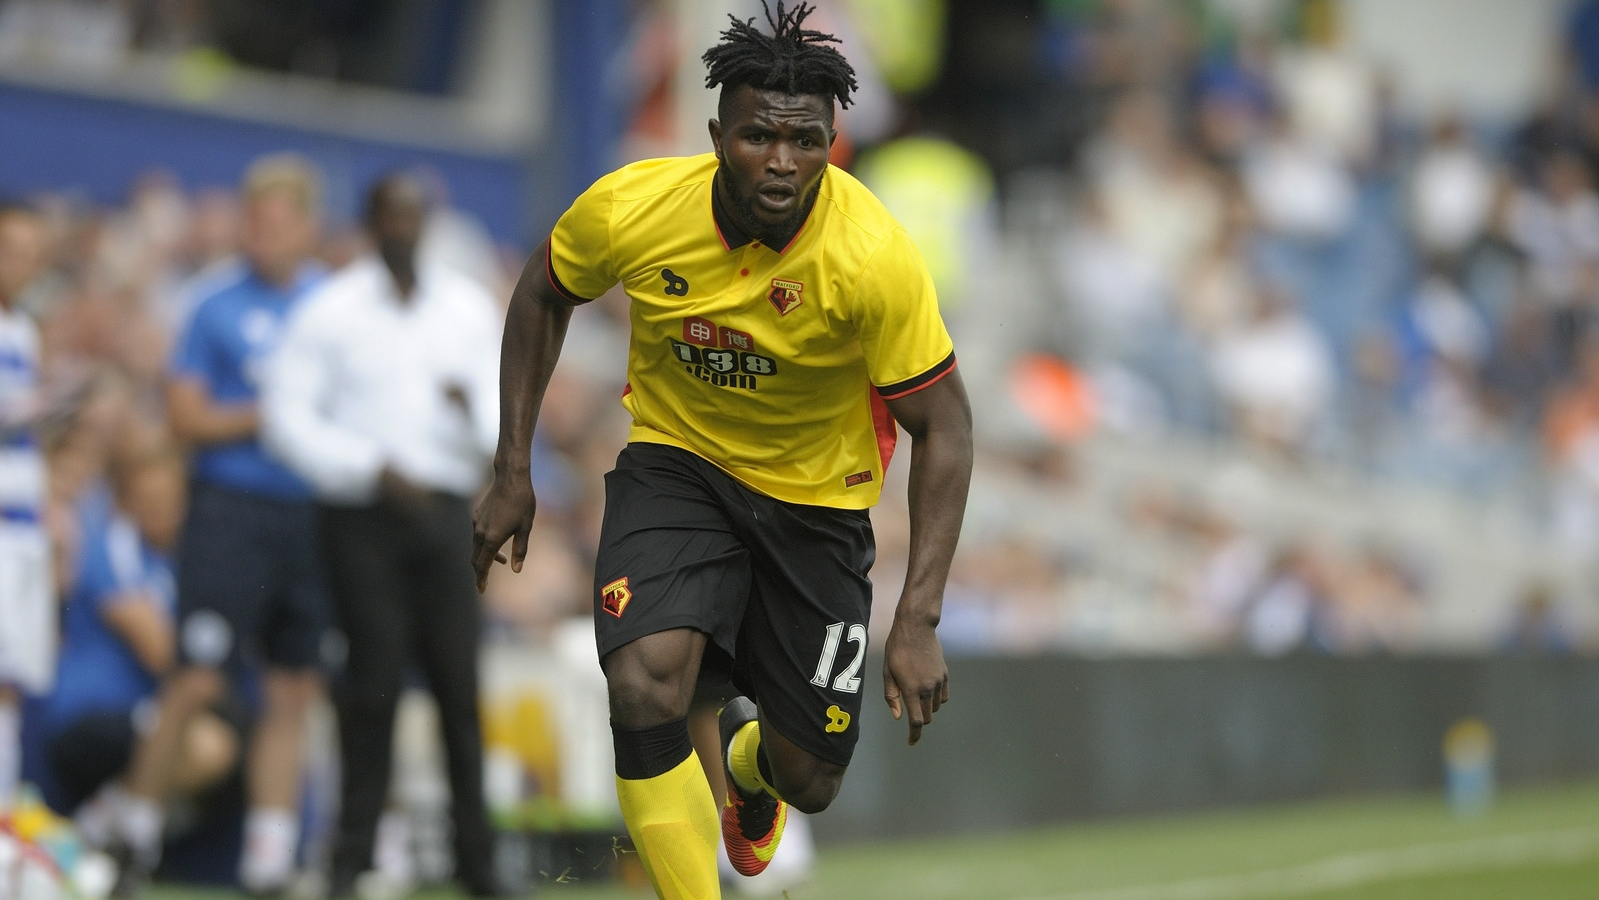 Success Injured, Doubtful For Watford Vs Swansea; Mazzarri Praises Ighalo Attitude